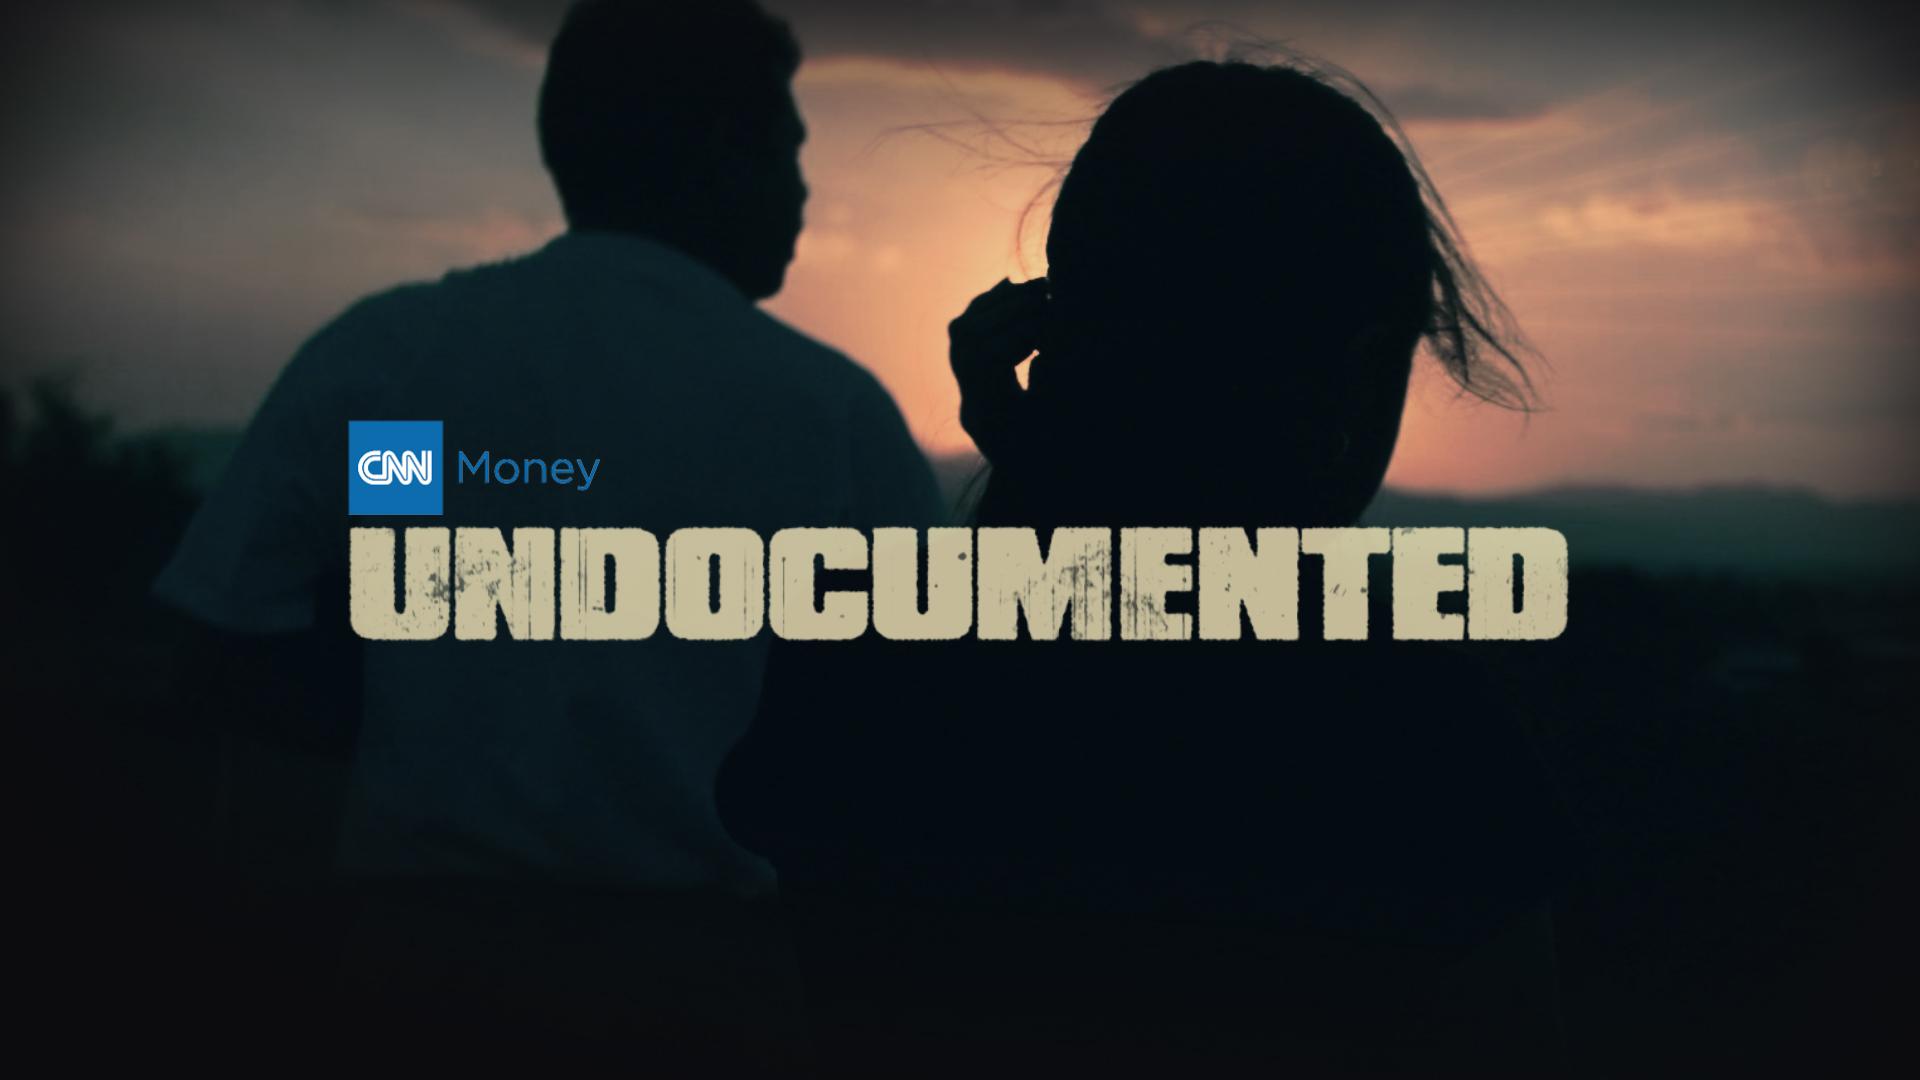 Copy of CNN I Undocumented I Short